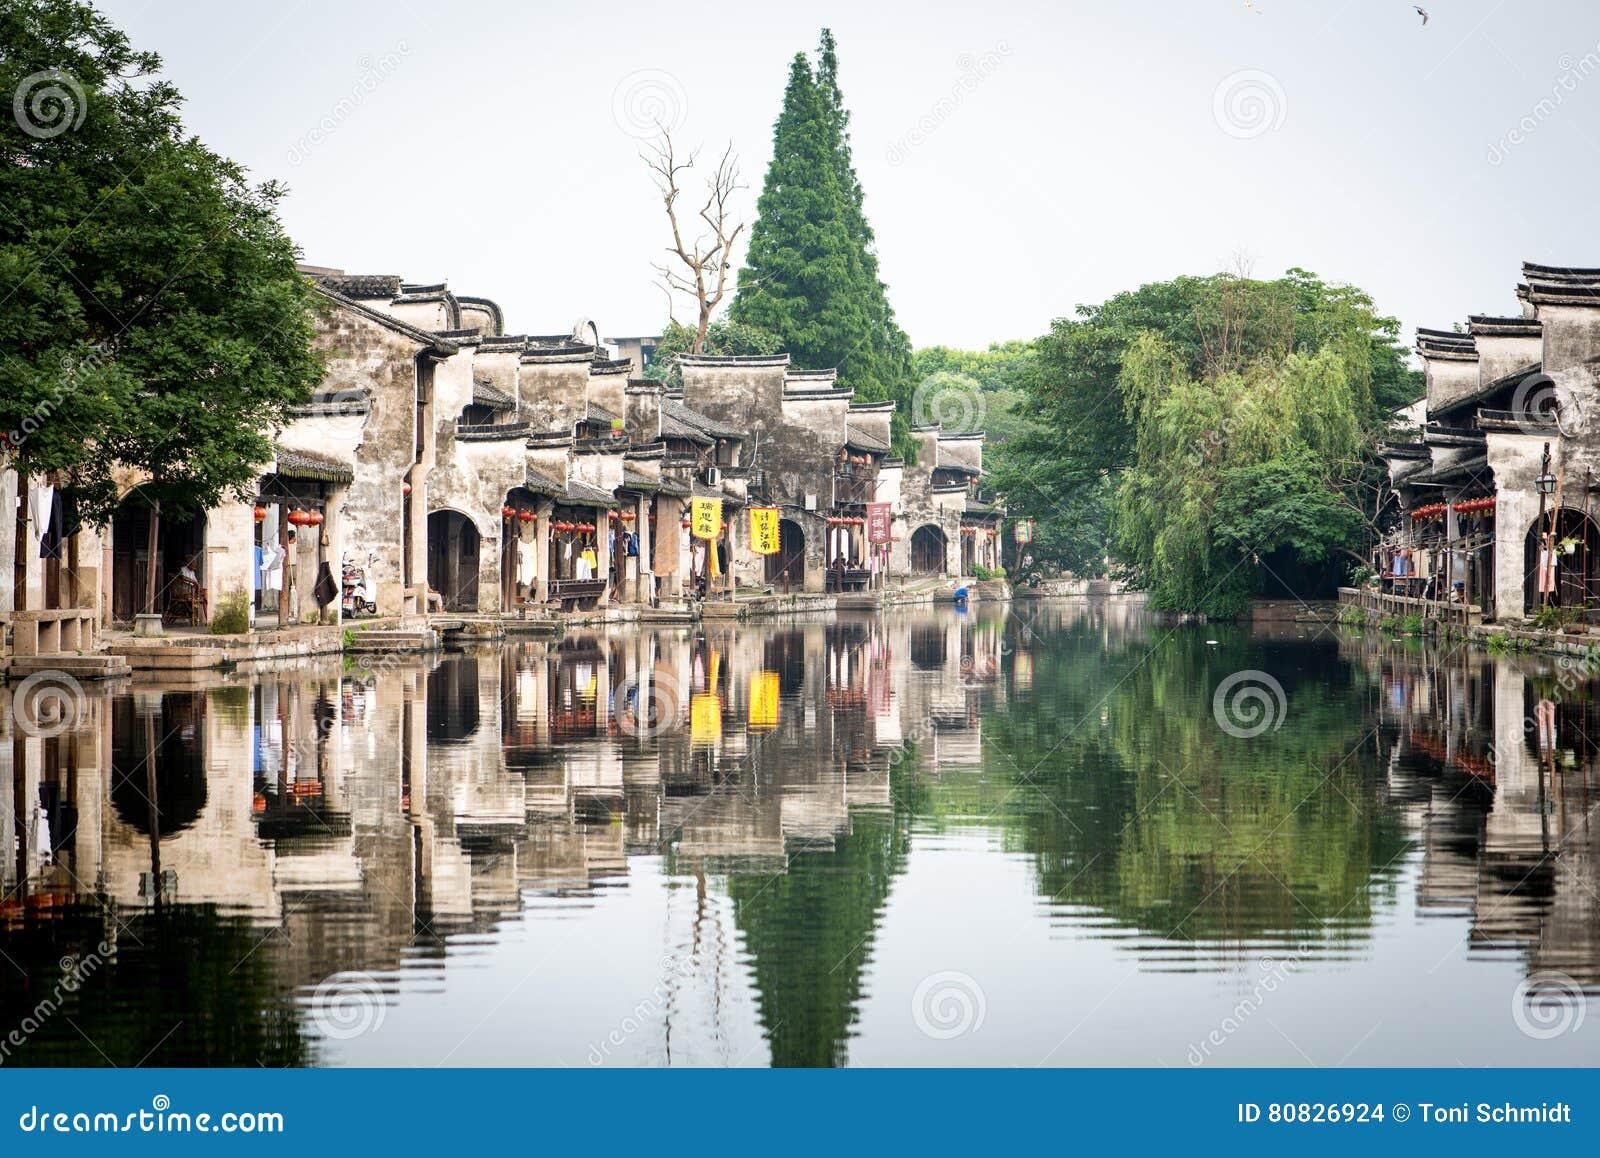 Kanal i en kinesiska watertown